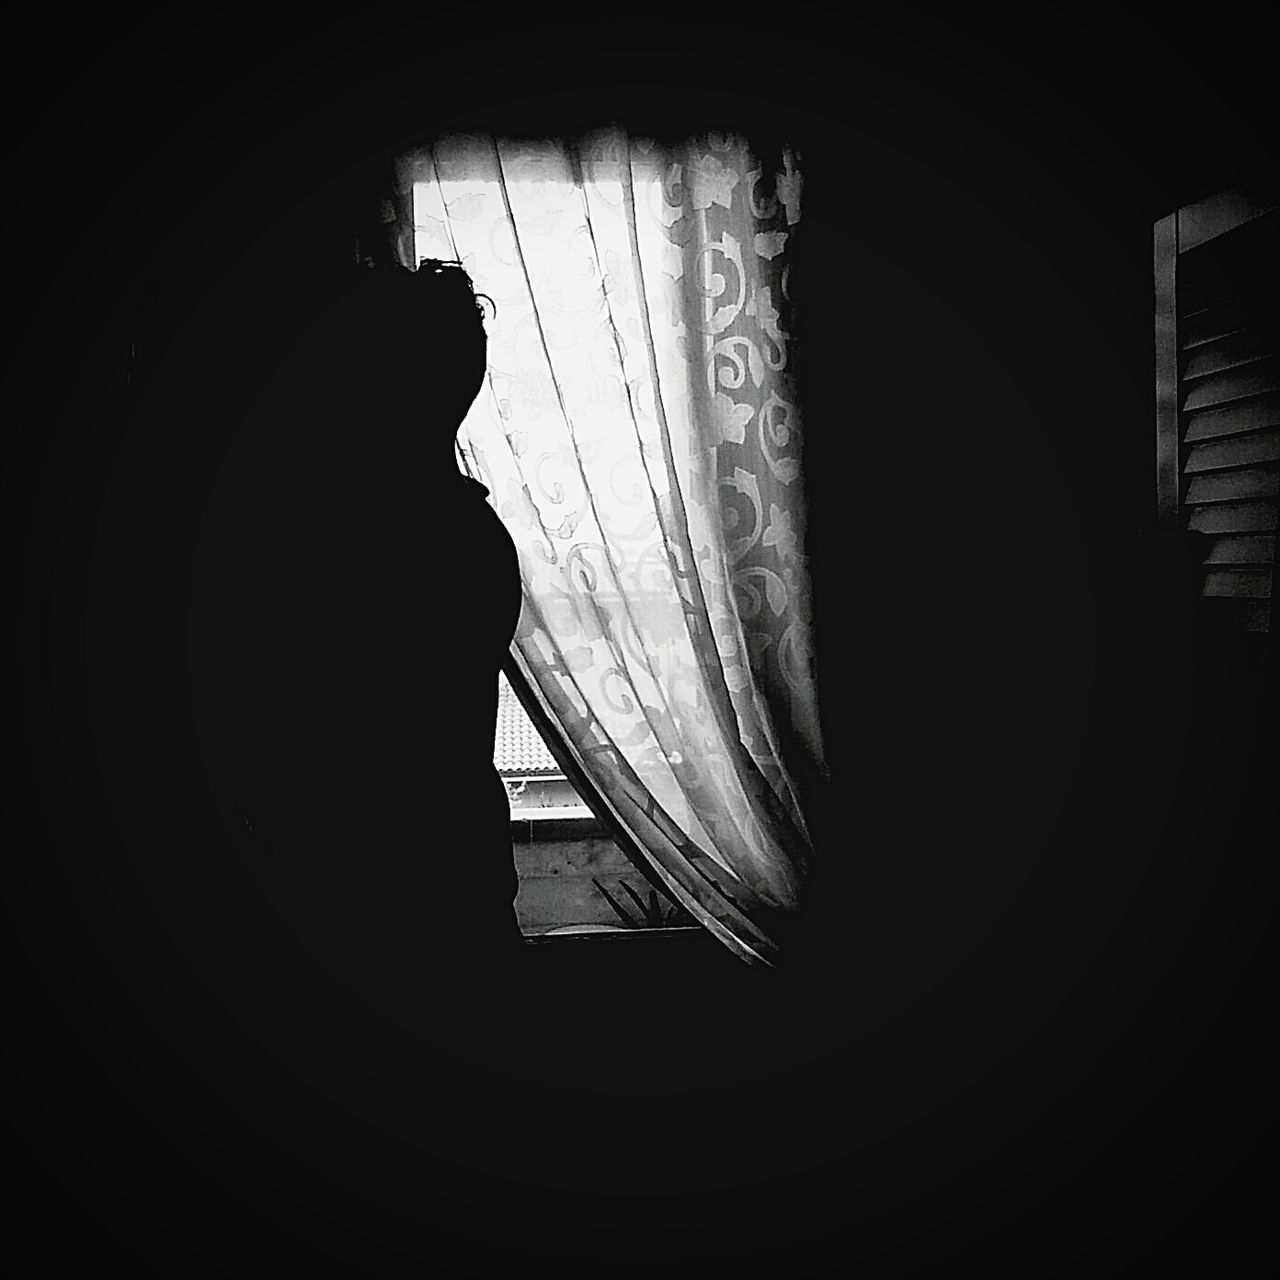 EyeEm Best Shots - Black + White Fashion Photography Silhouette_collection Capture Moment Eyeem Market EyeEm Market ©